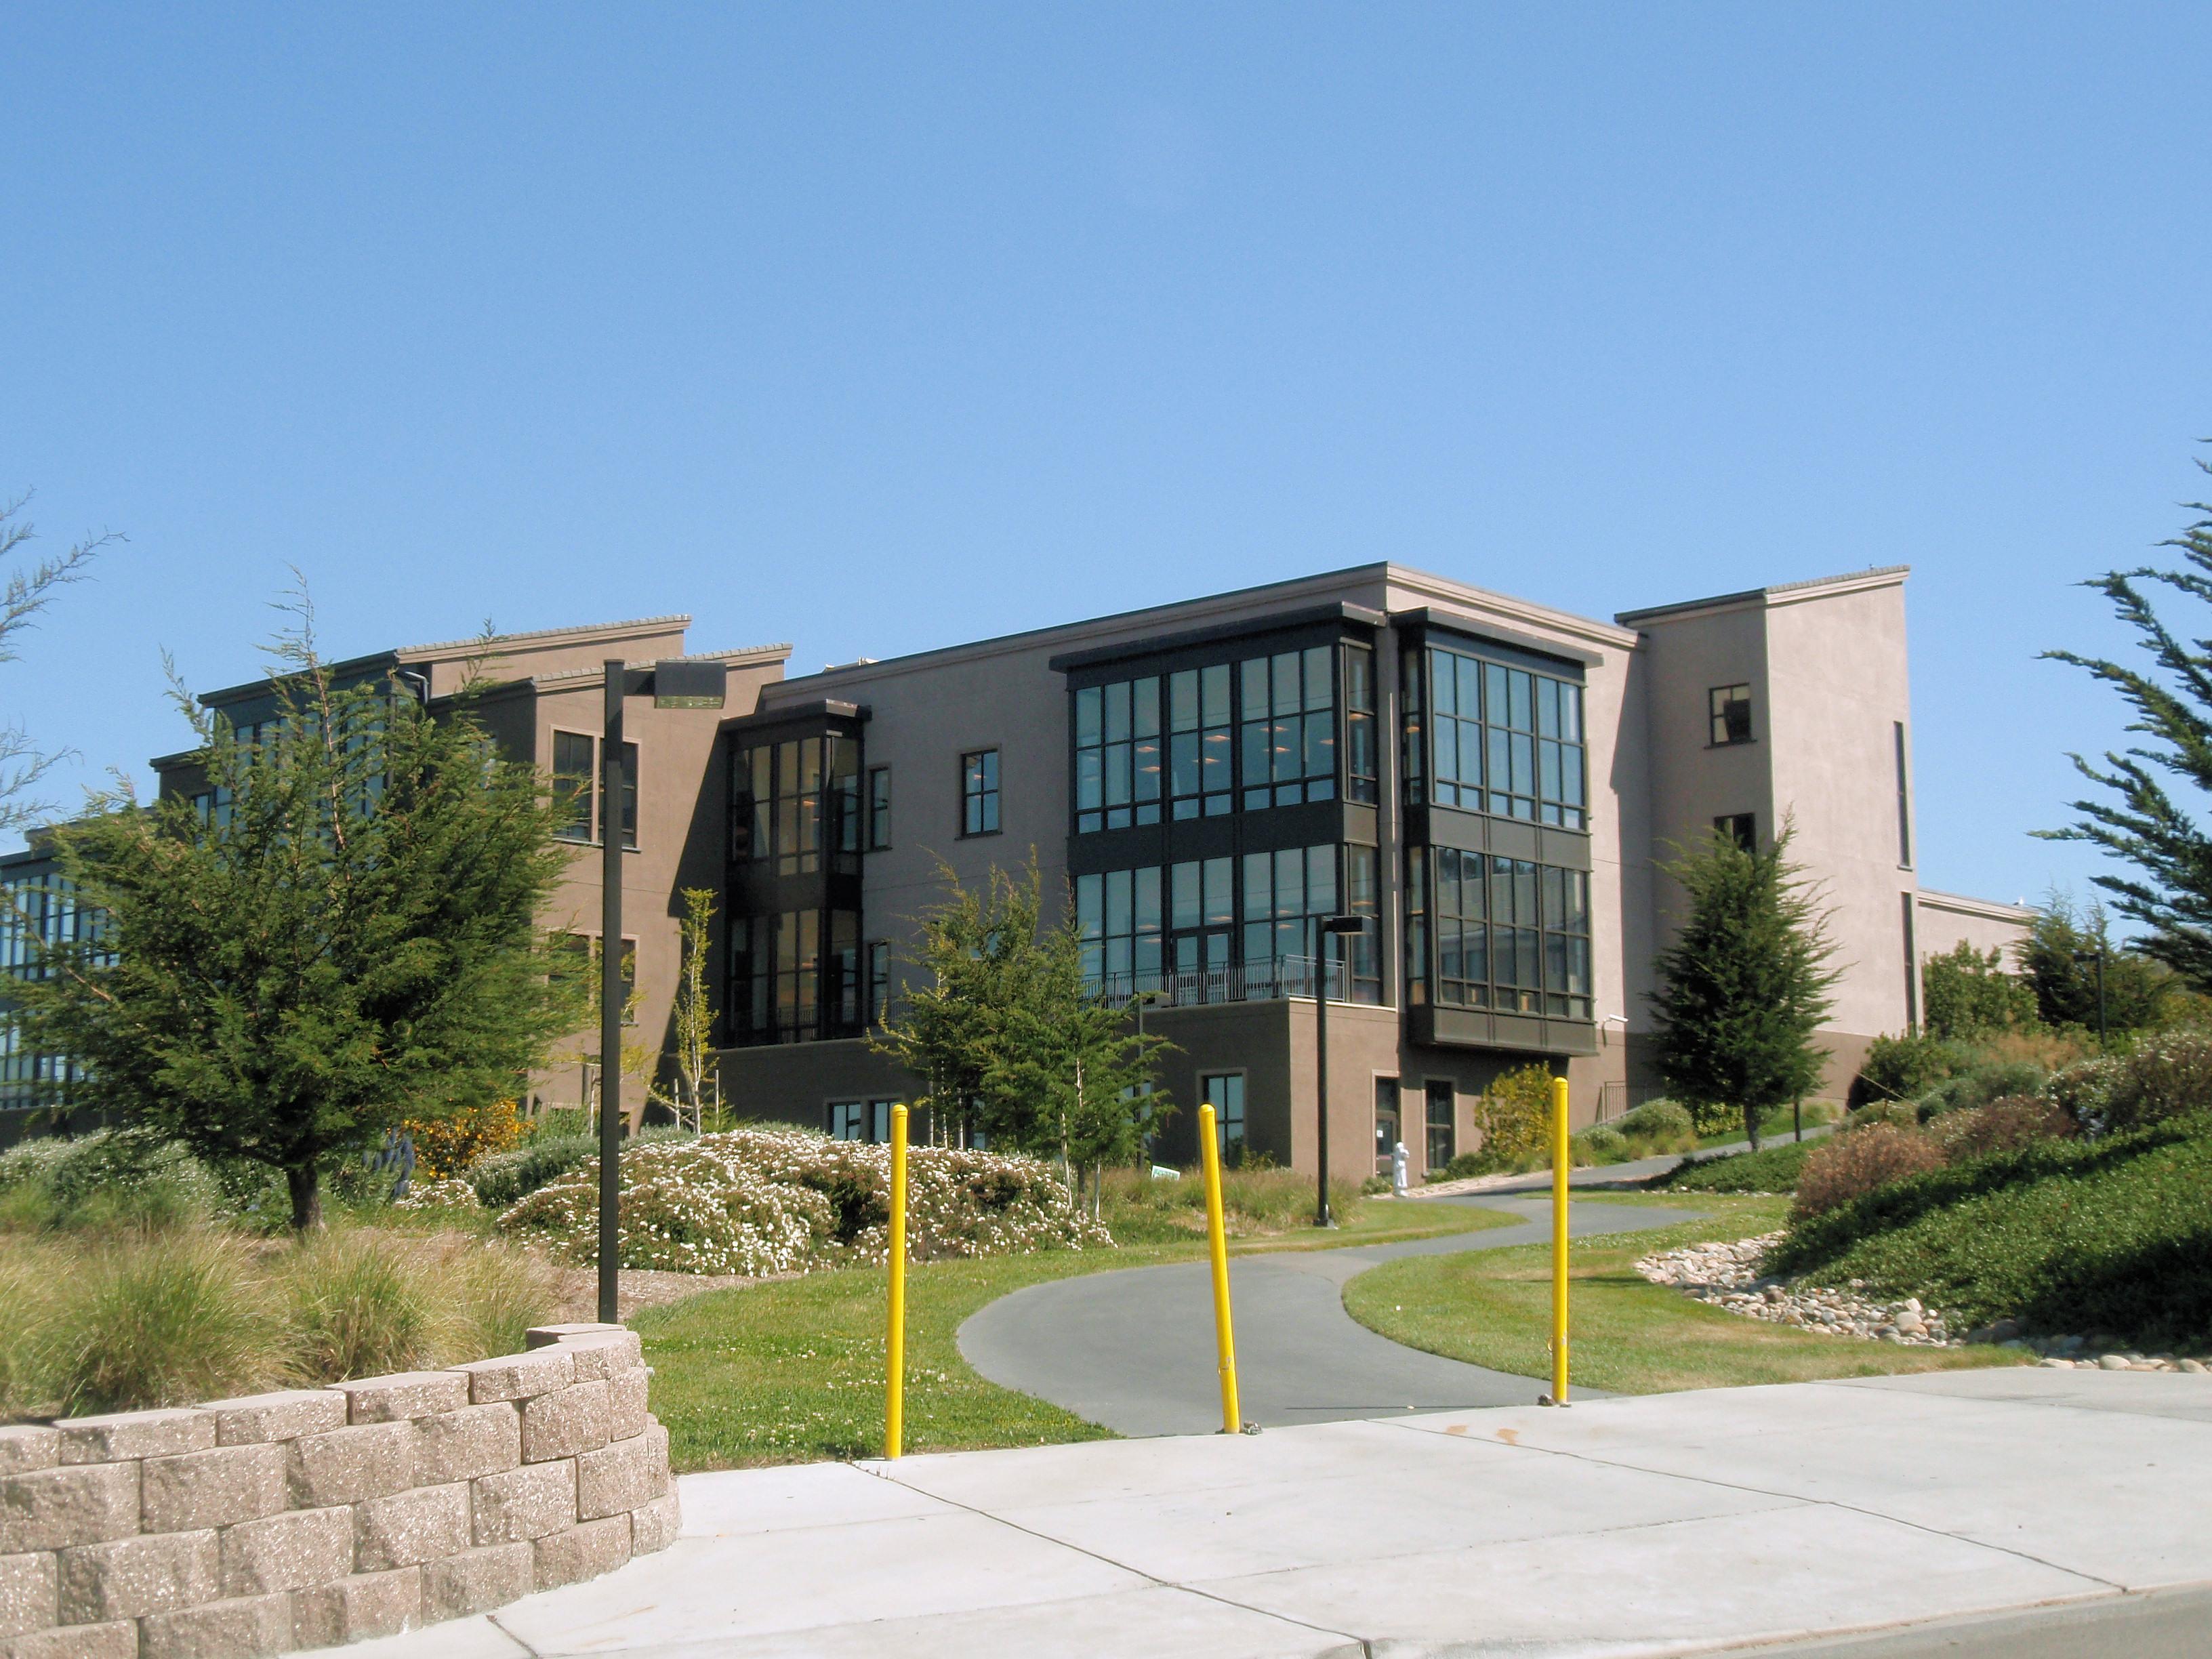 4%2f41%2fmonterey peninsula college building